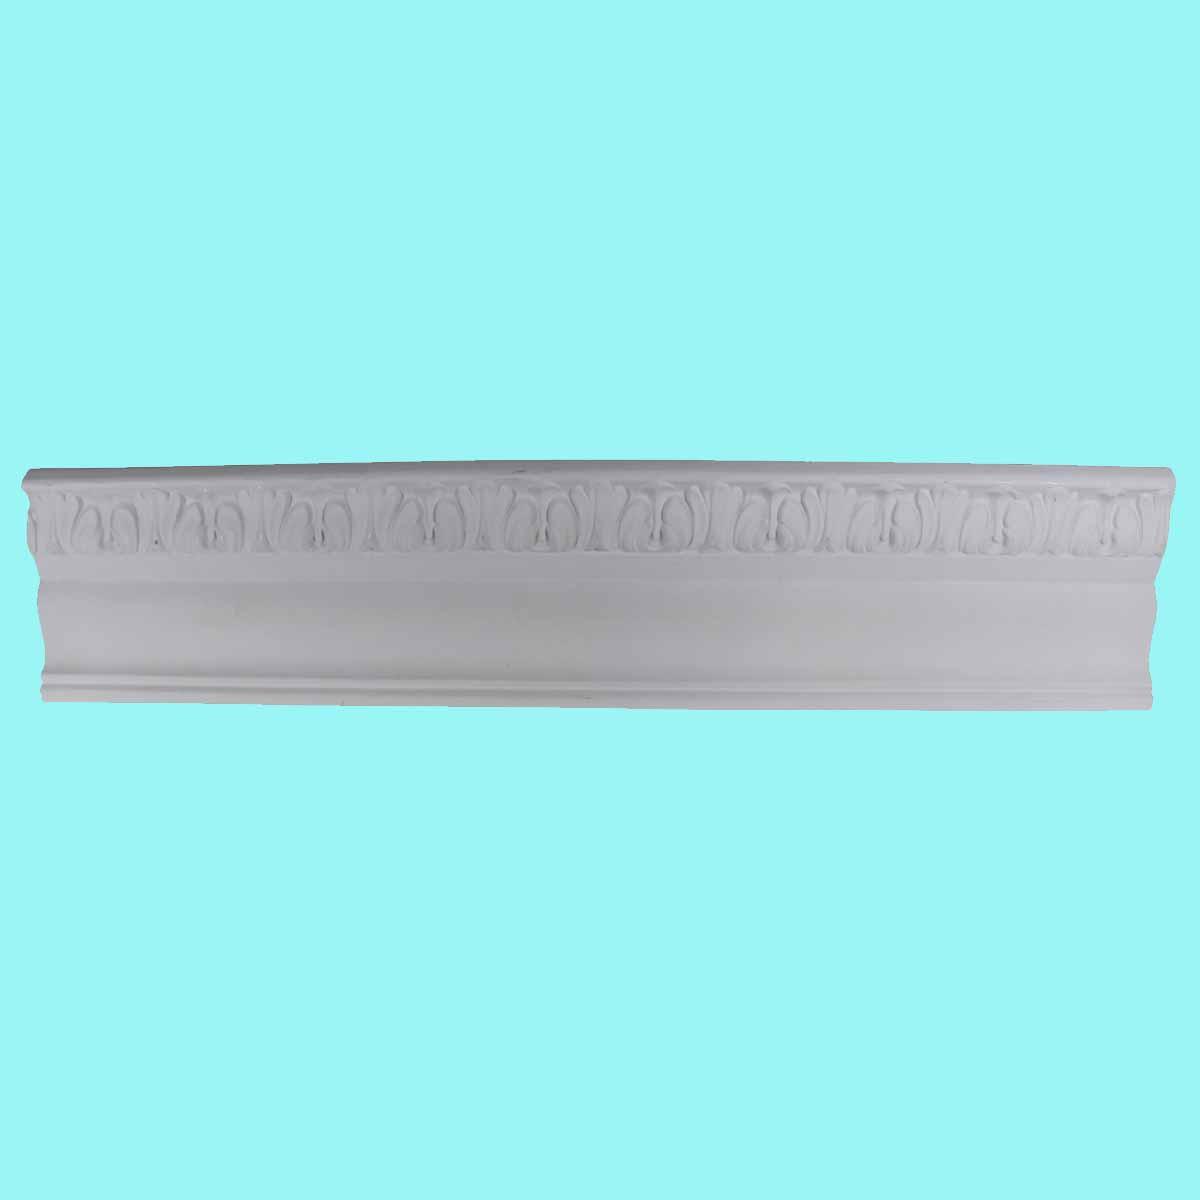 Cornice White Urethane Sample of 12408 24 Cornice Cornice Moulding Cornice Molding